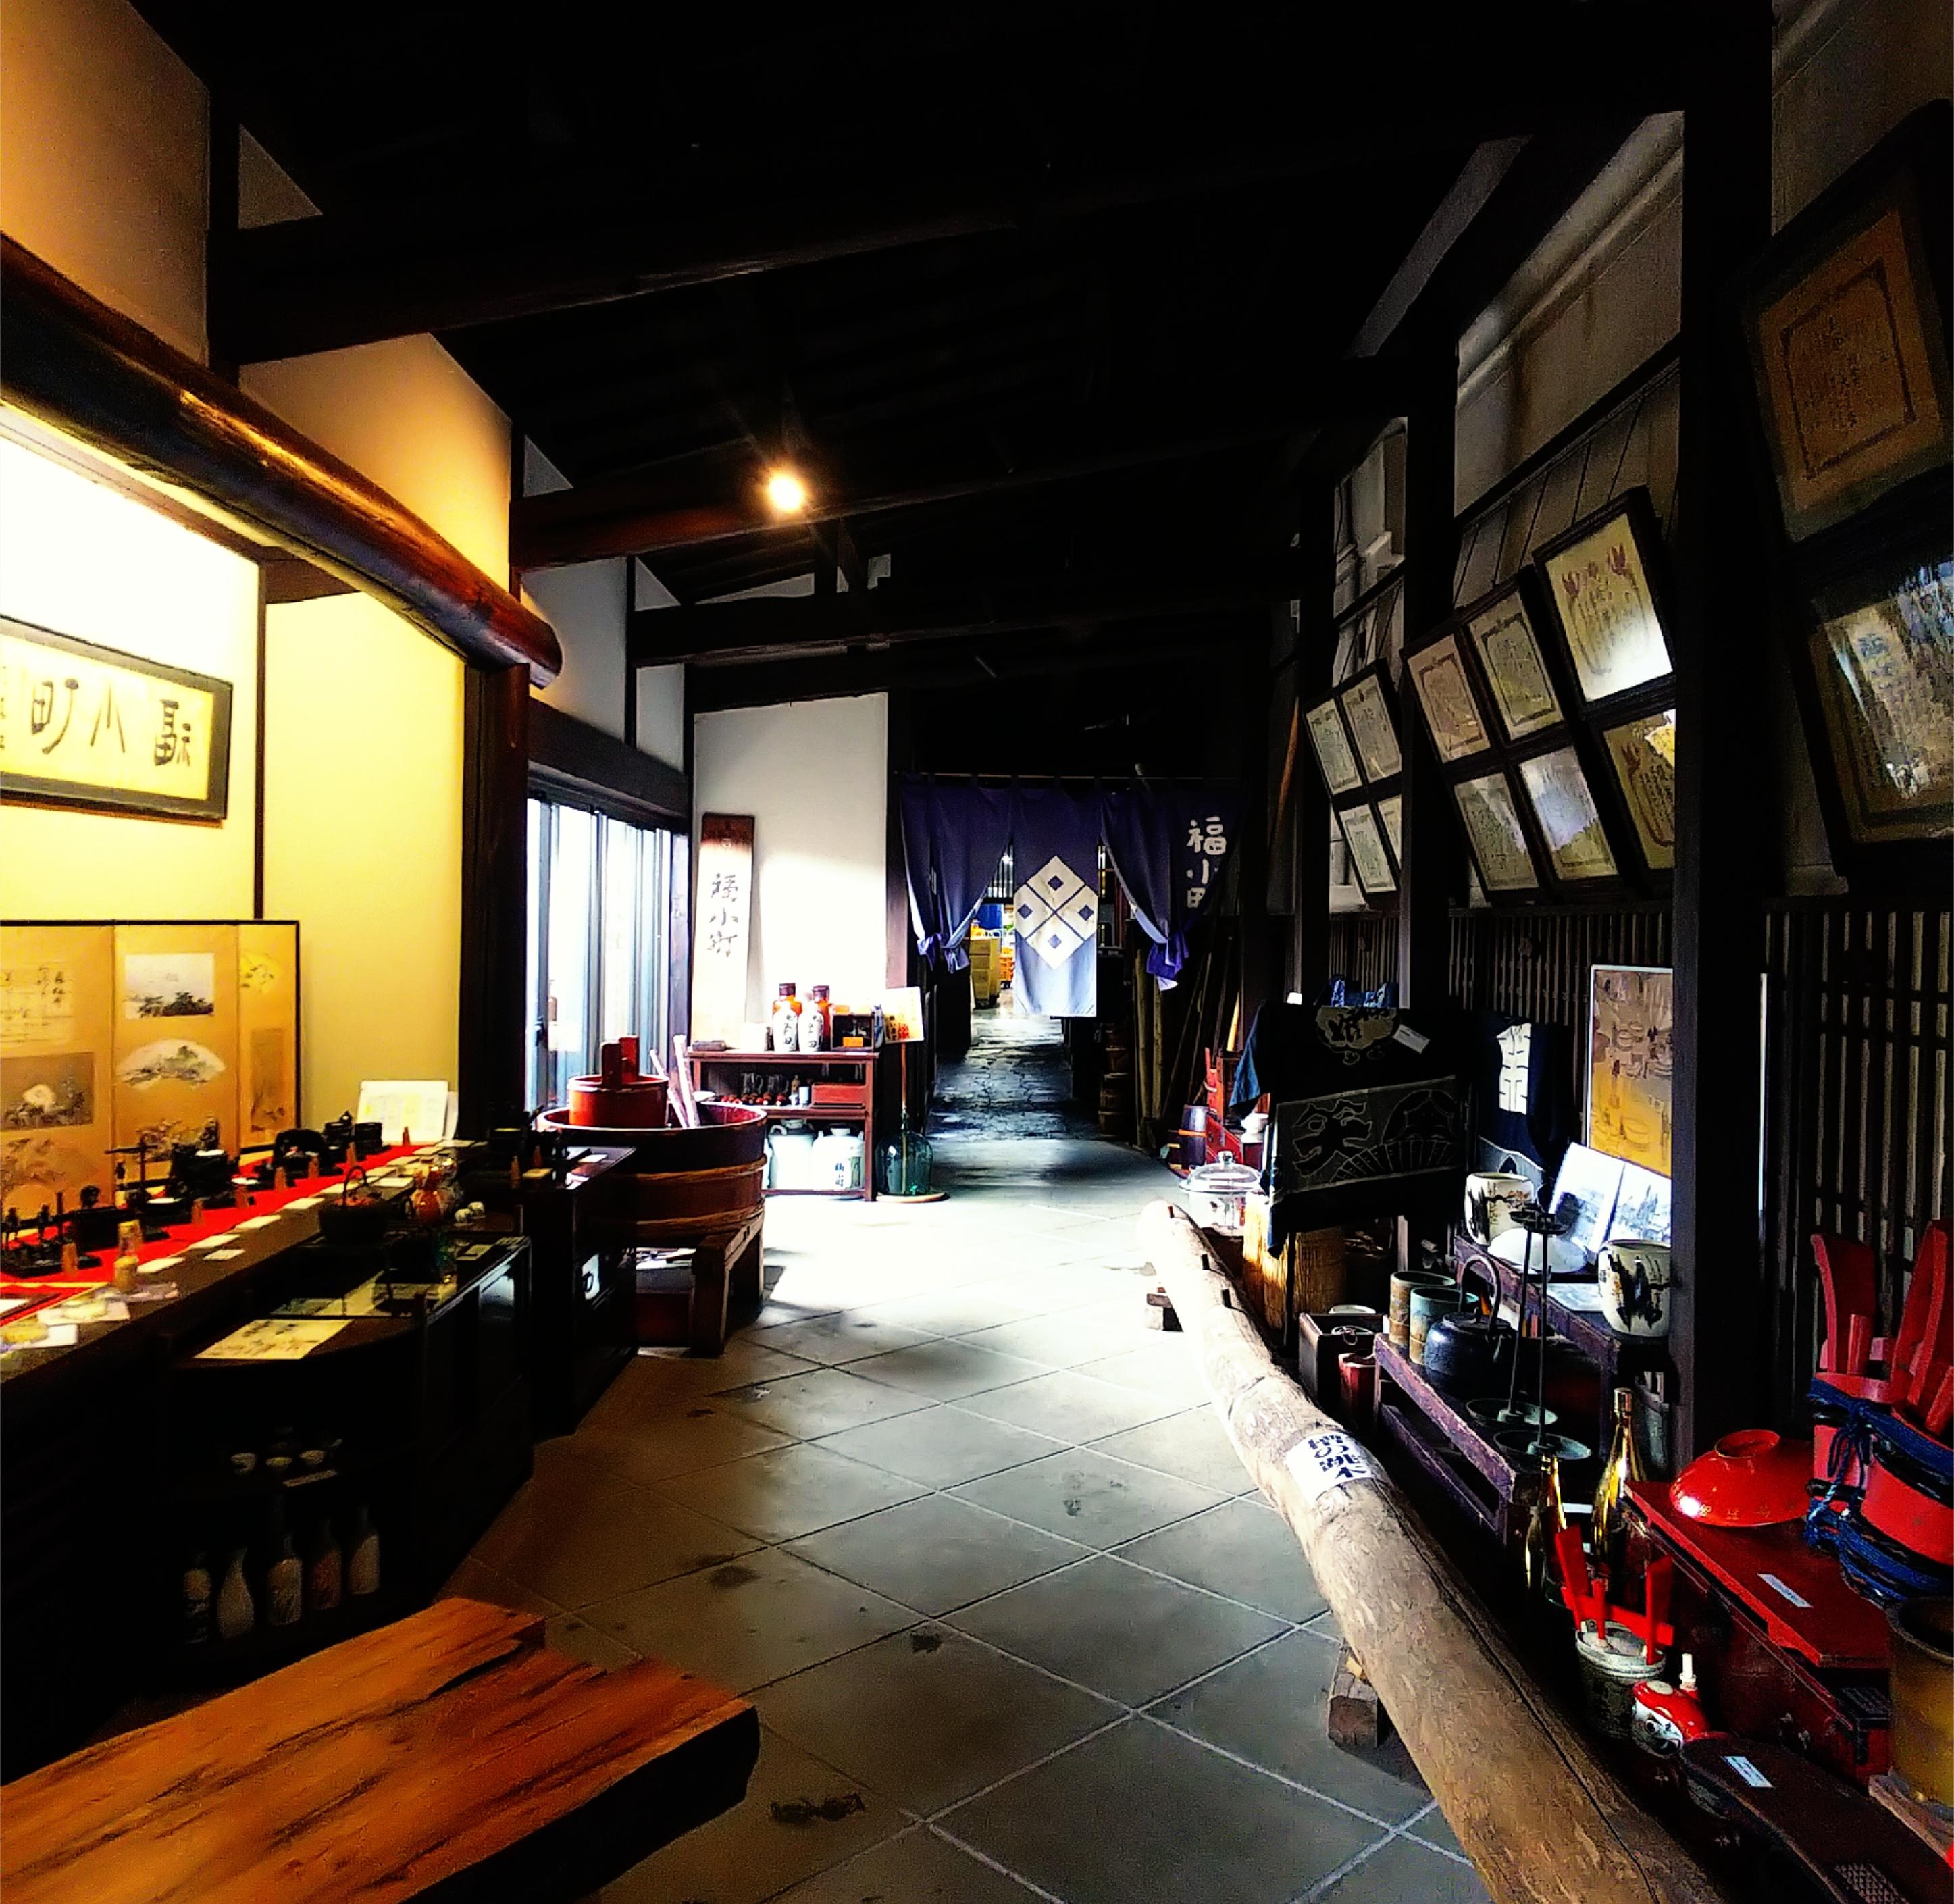 http://www.fukukomachi.com/blog/photo/C360_2020-09-04-15-44-59-004.jpg